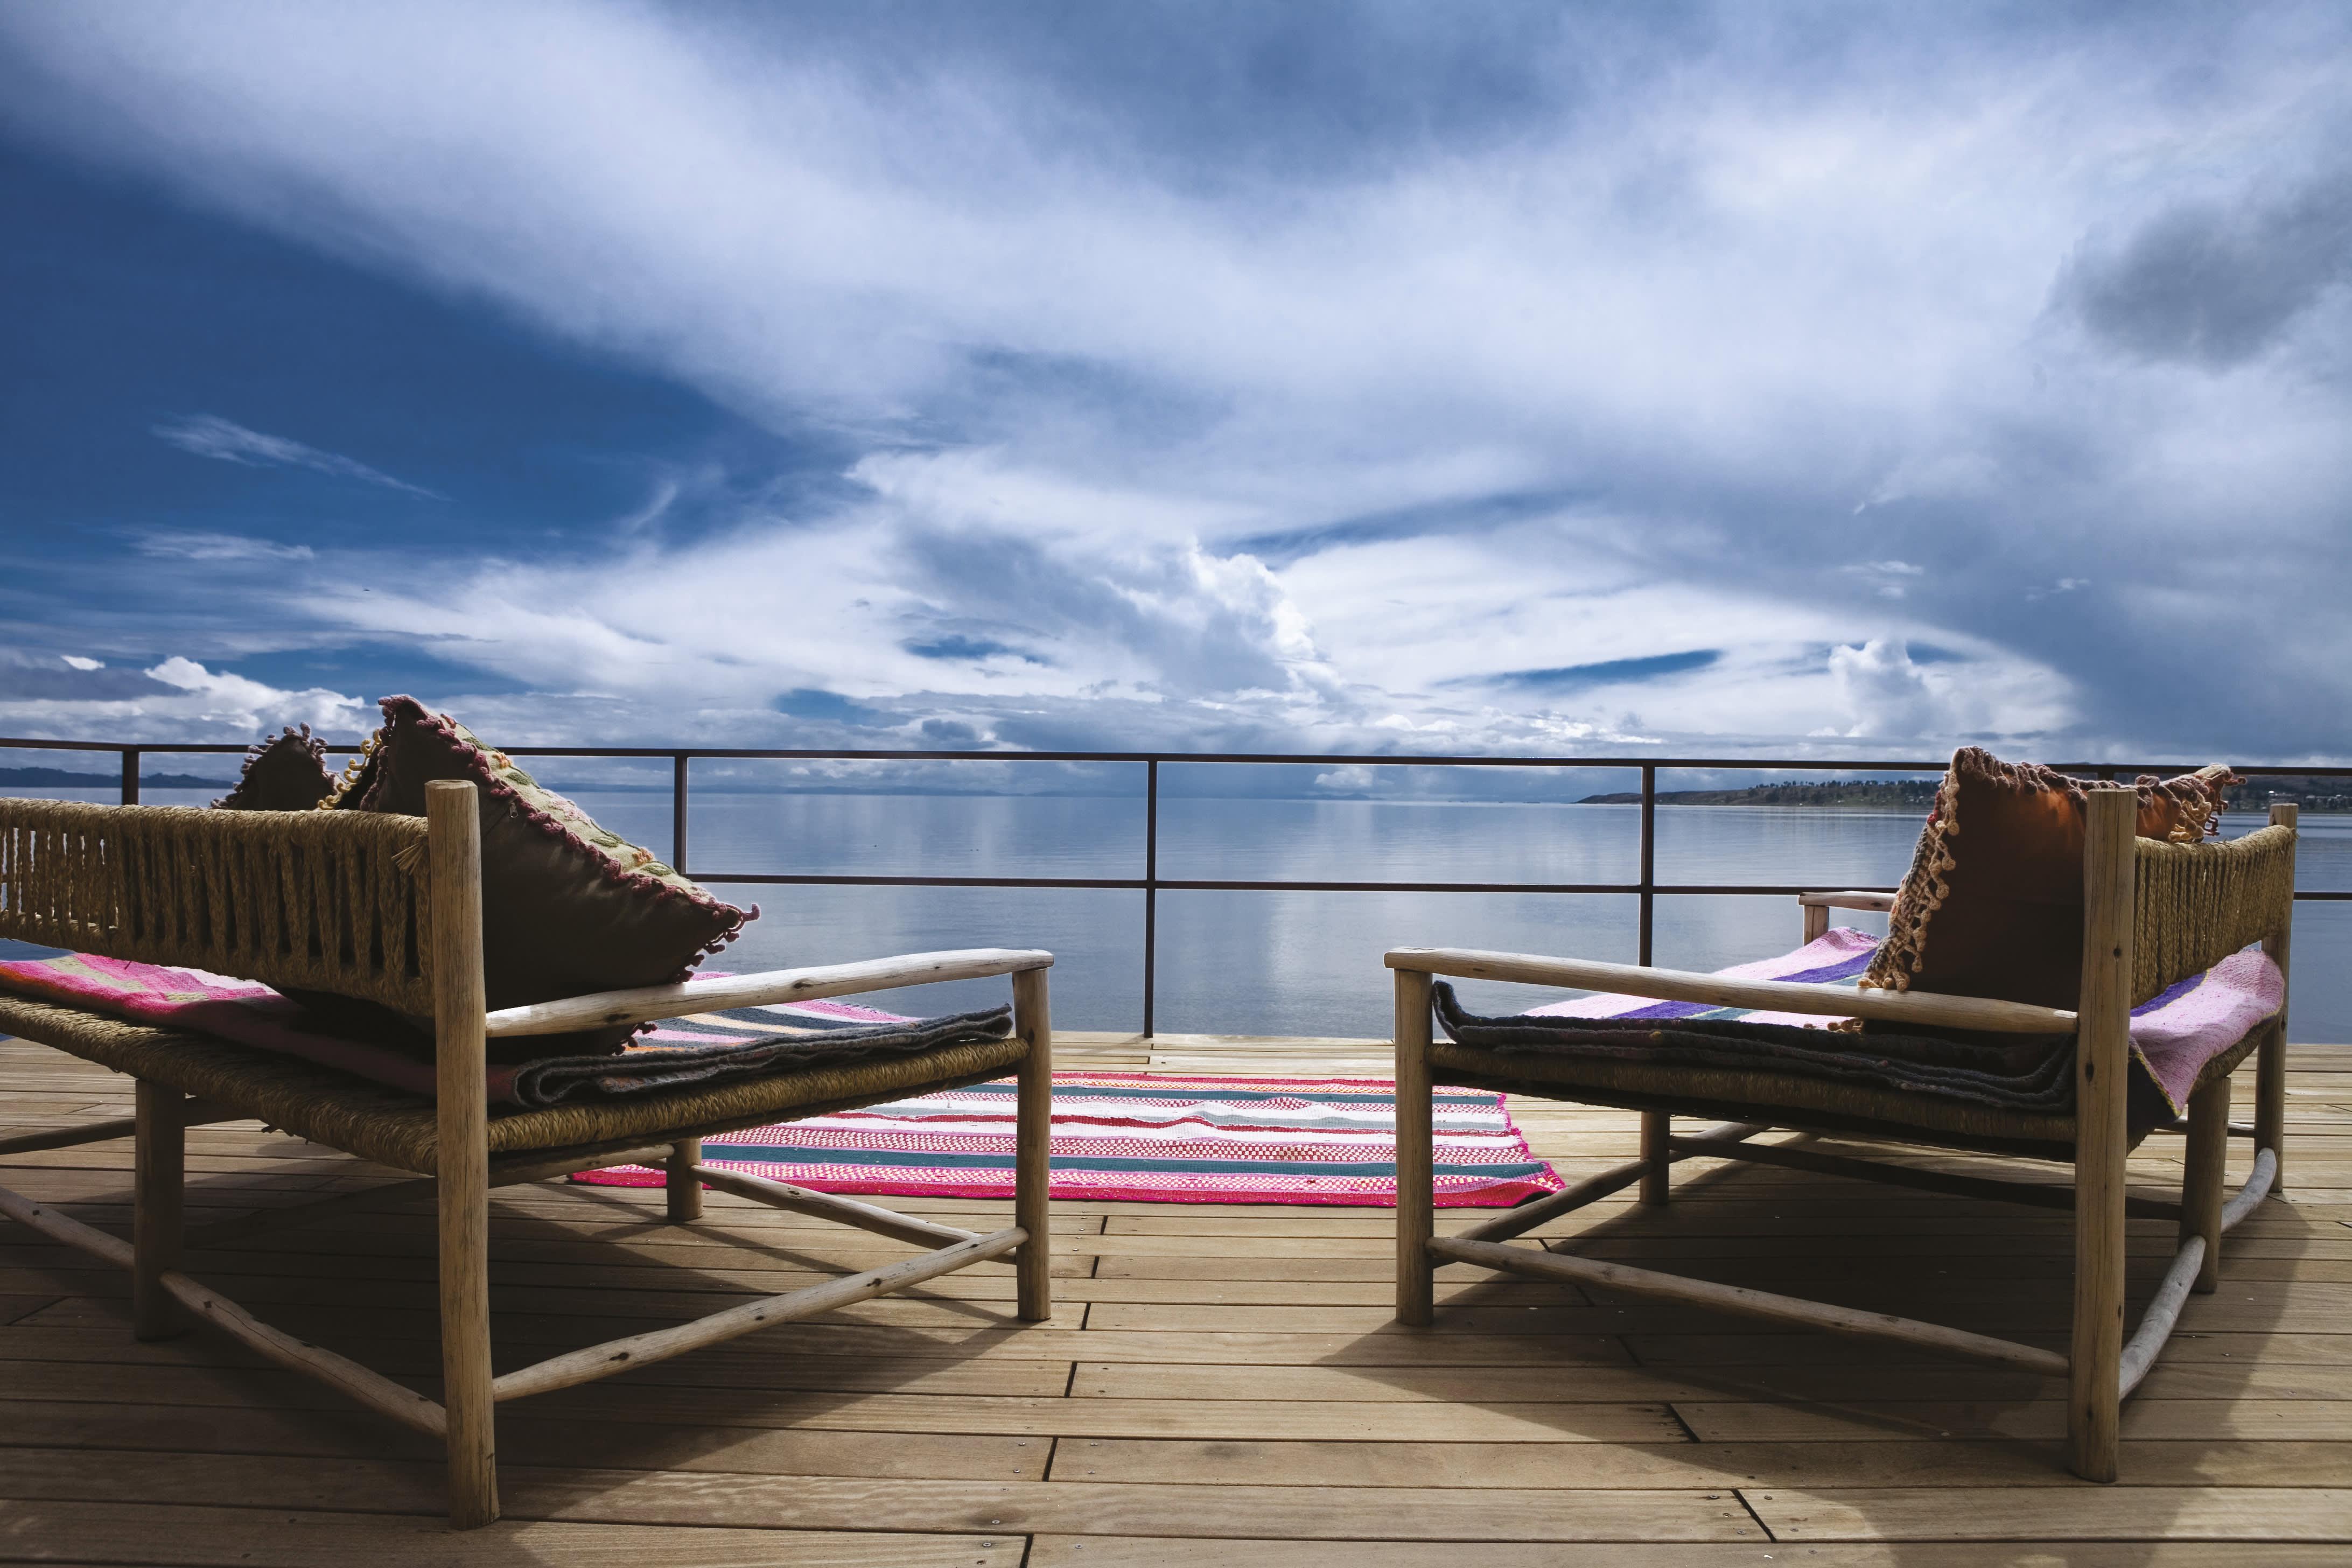 best relaxing hotels to unwind in peru